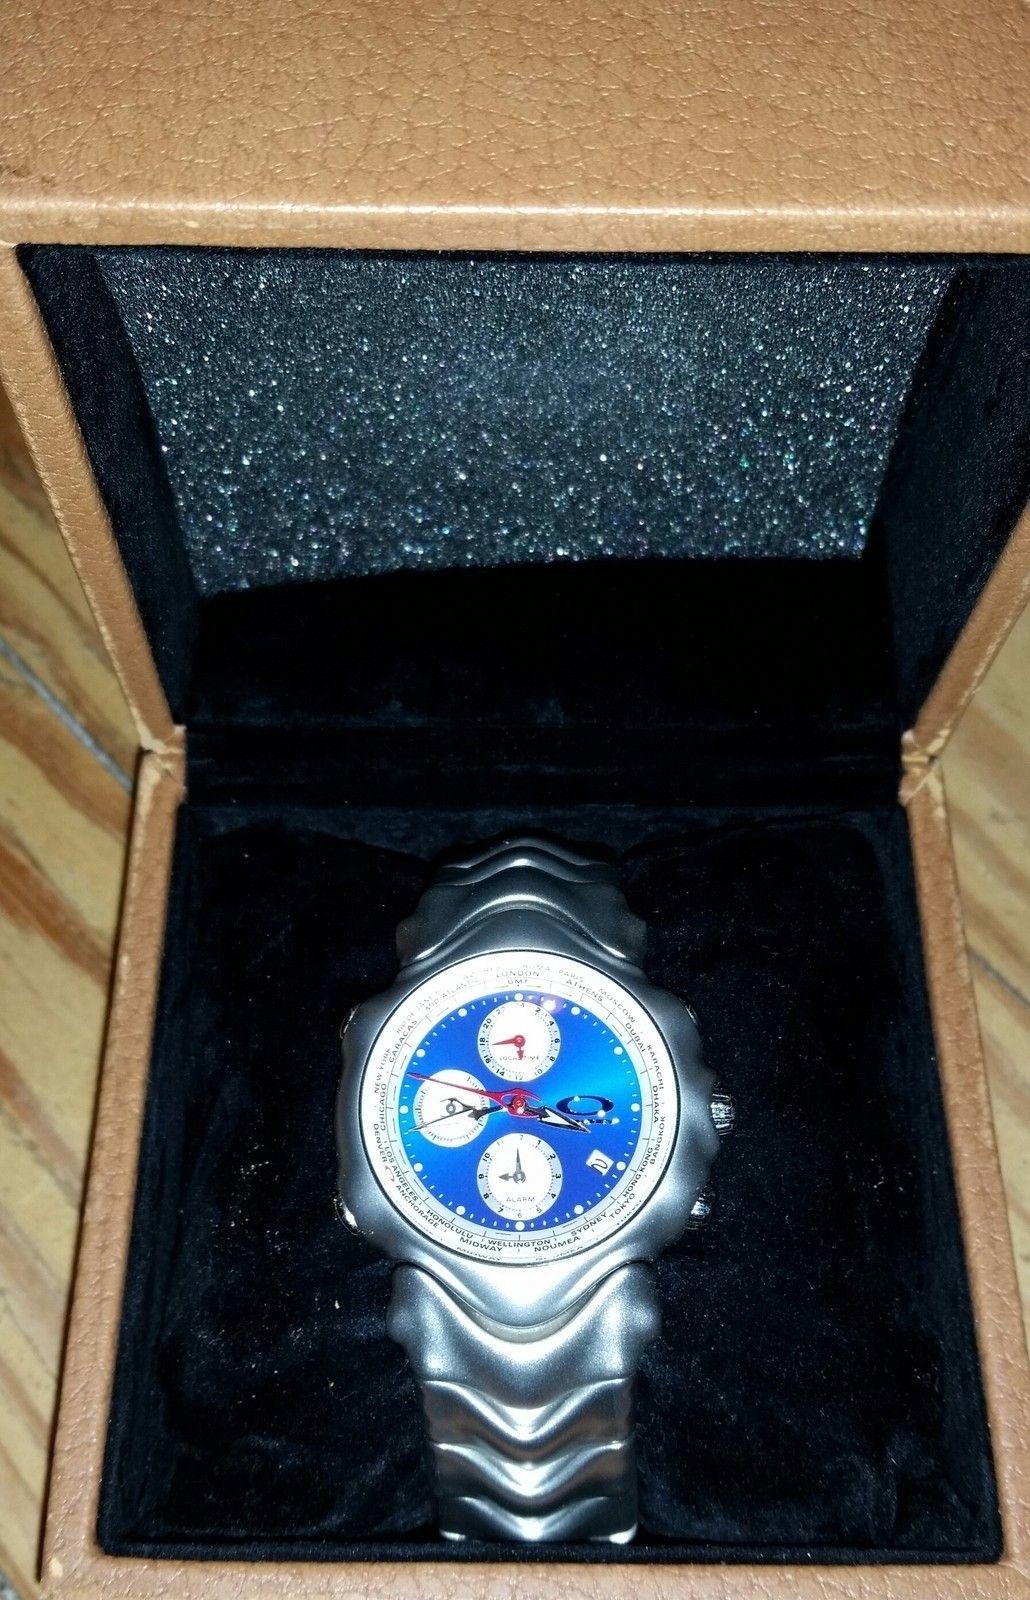 GMT Silver with Blue Face - uploadfromtaptalk1416890232721.jpg